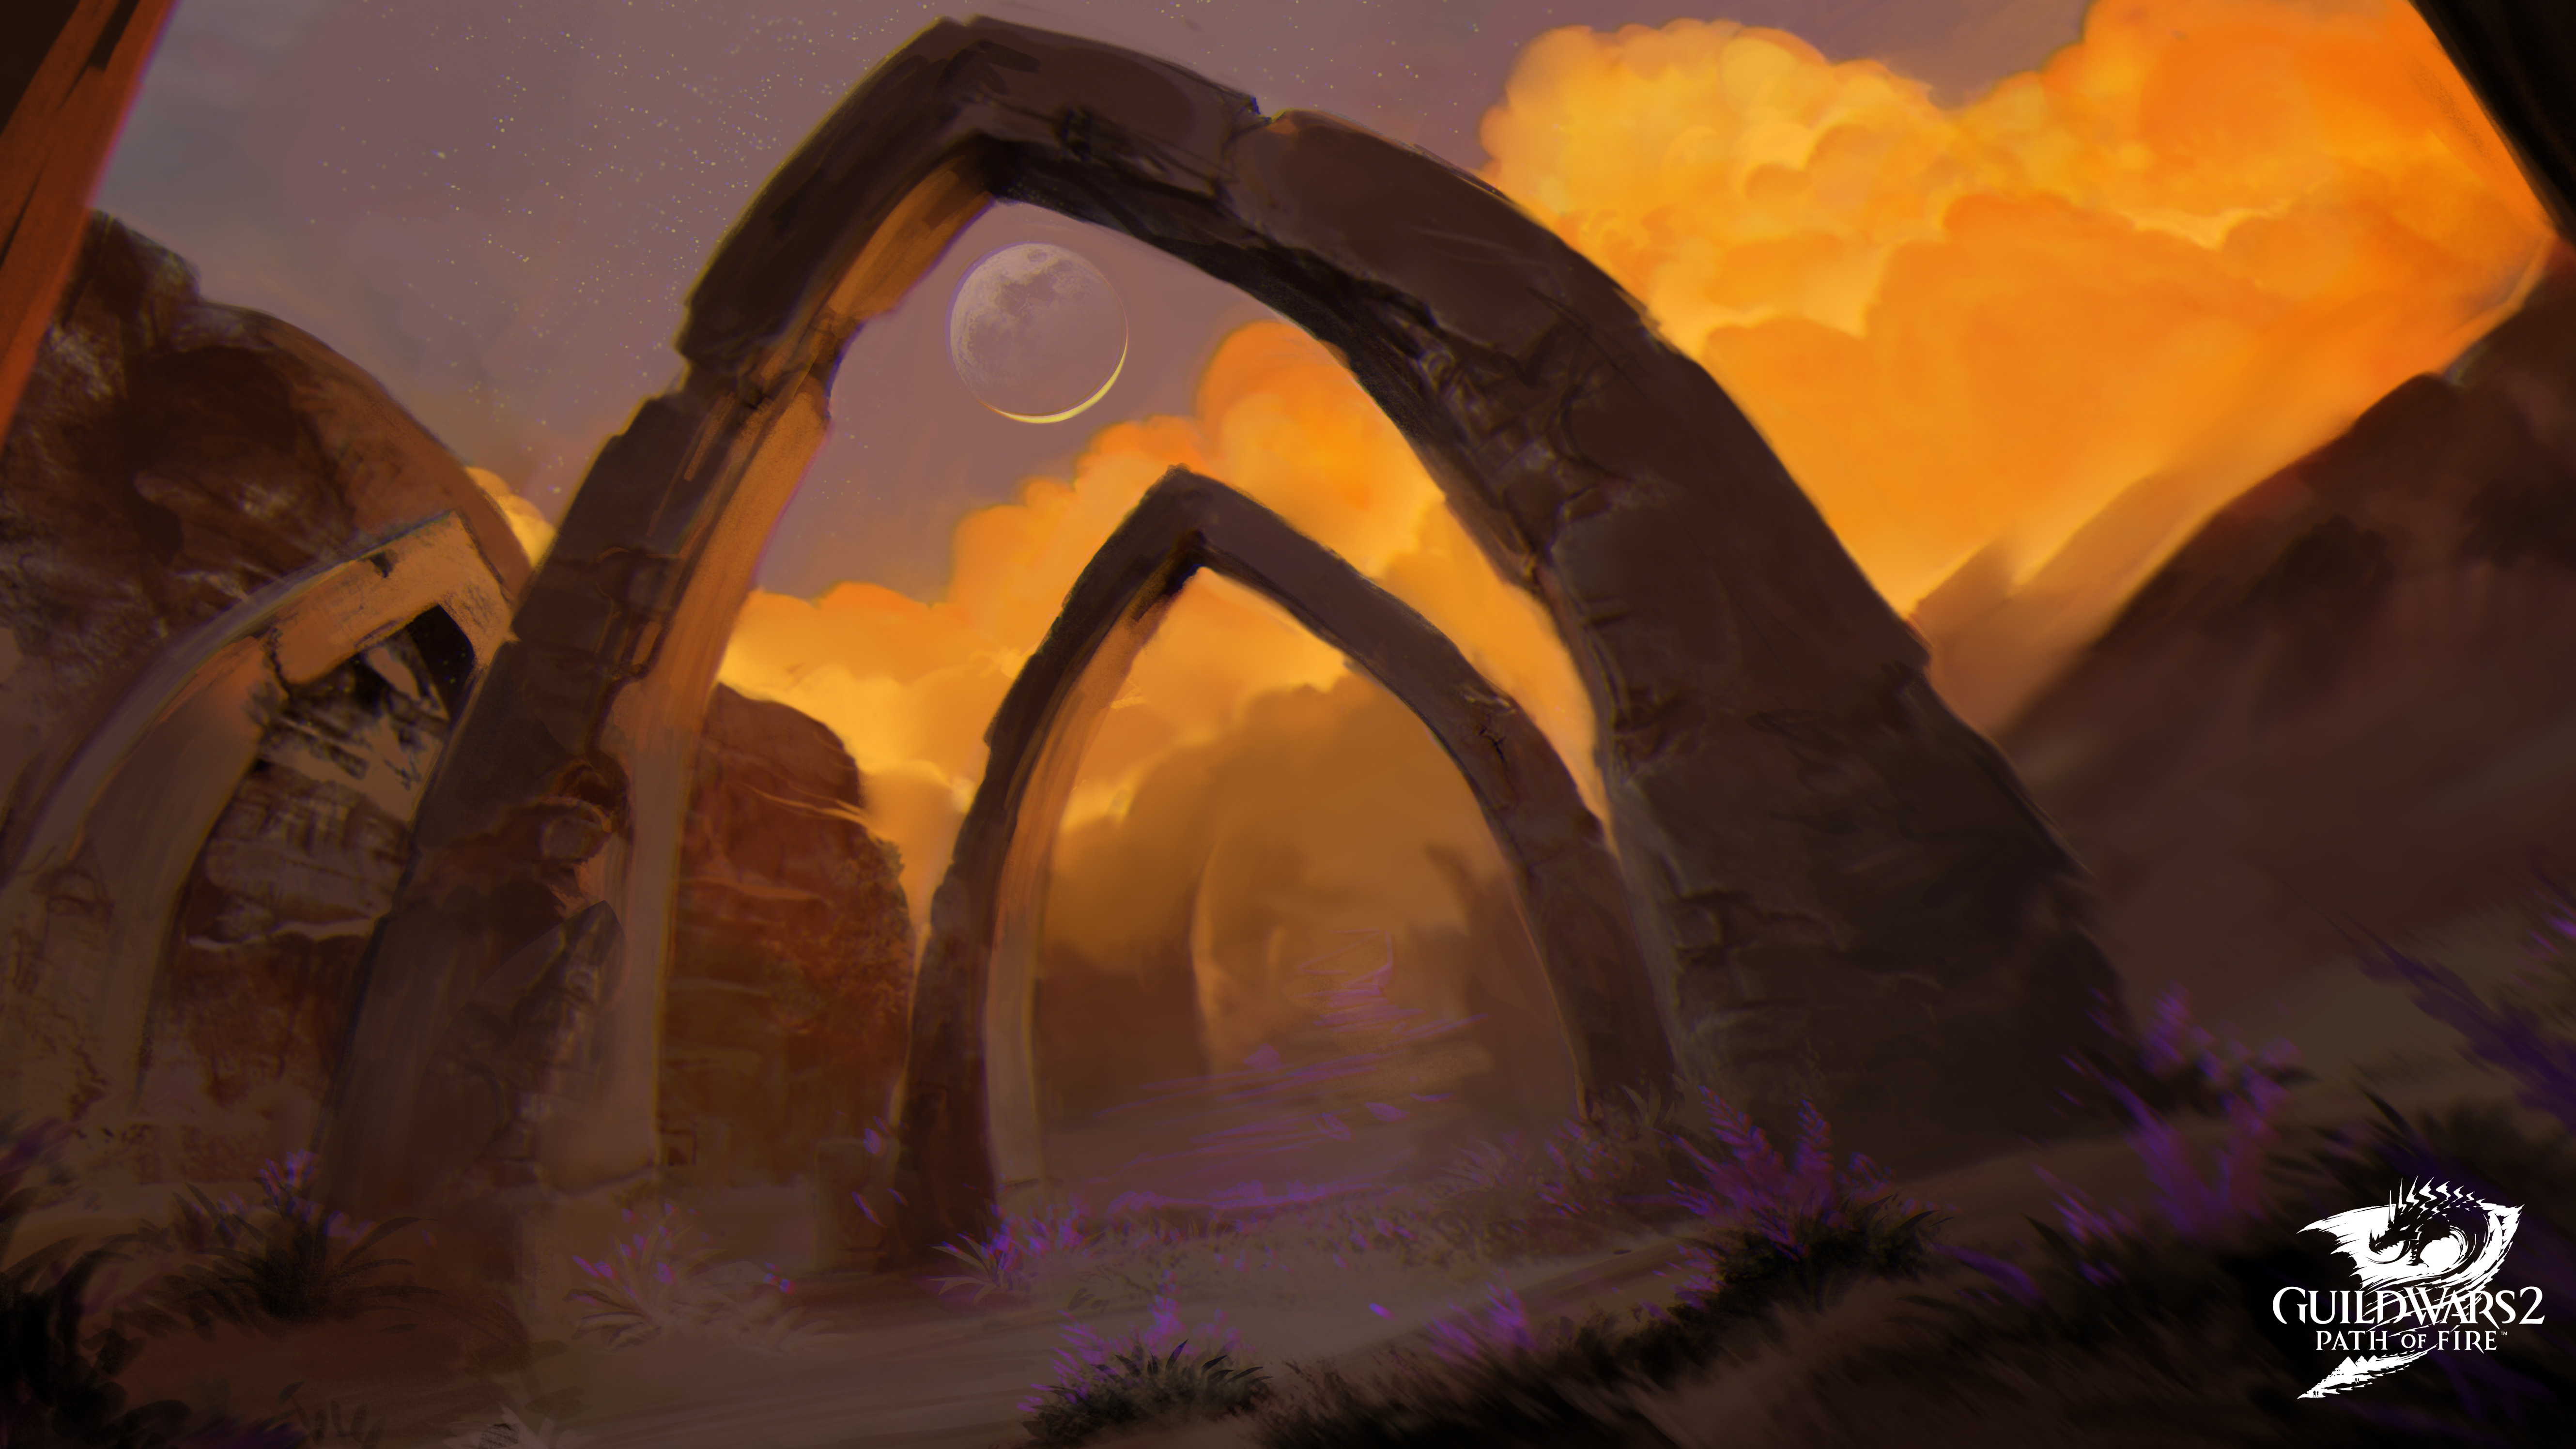 Concept Art Guildwars2com